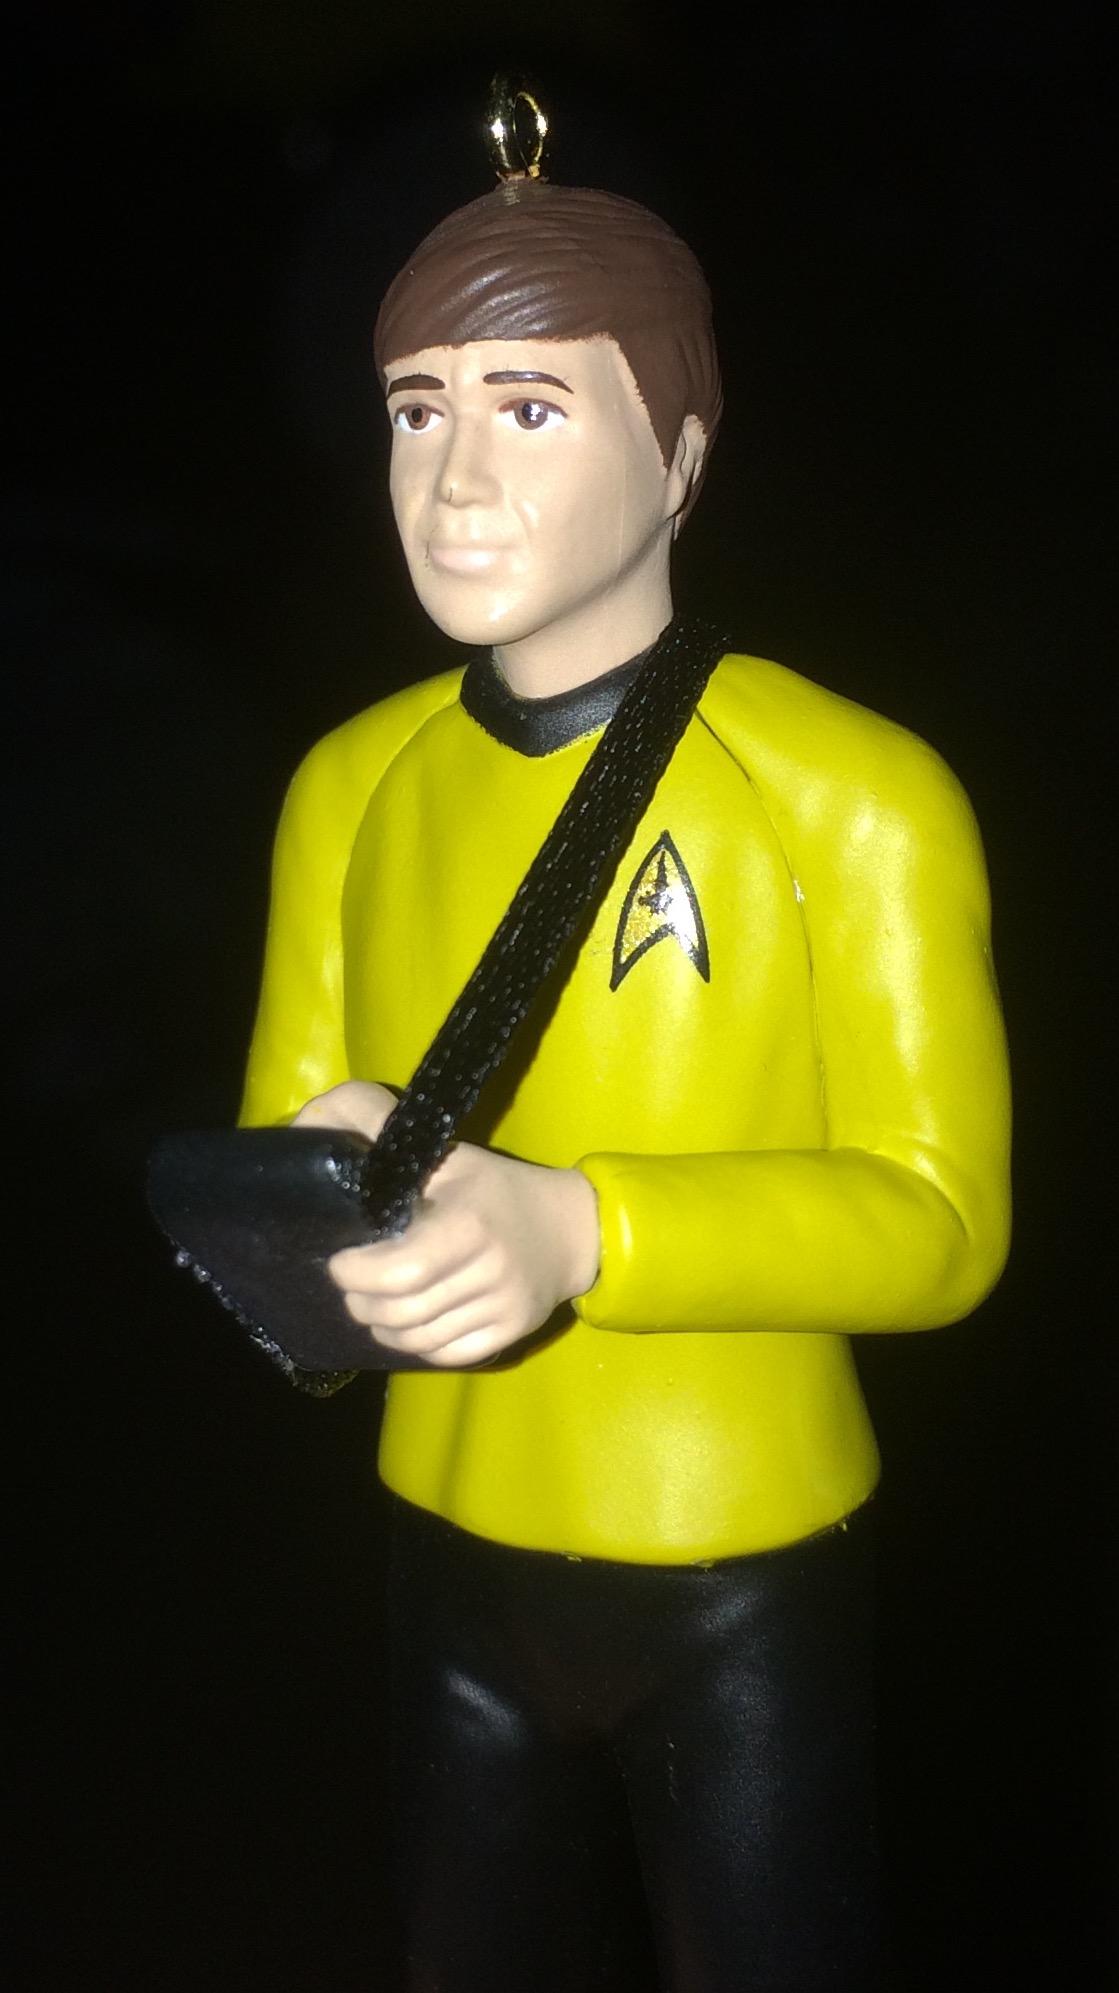 Chekov Hallmark Star Trek Ornaments